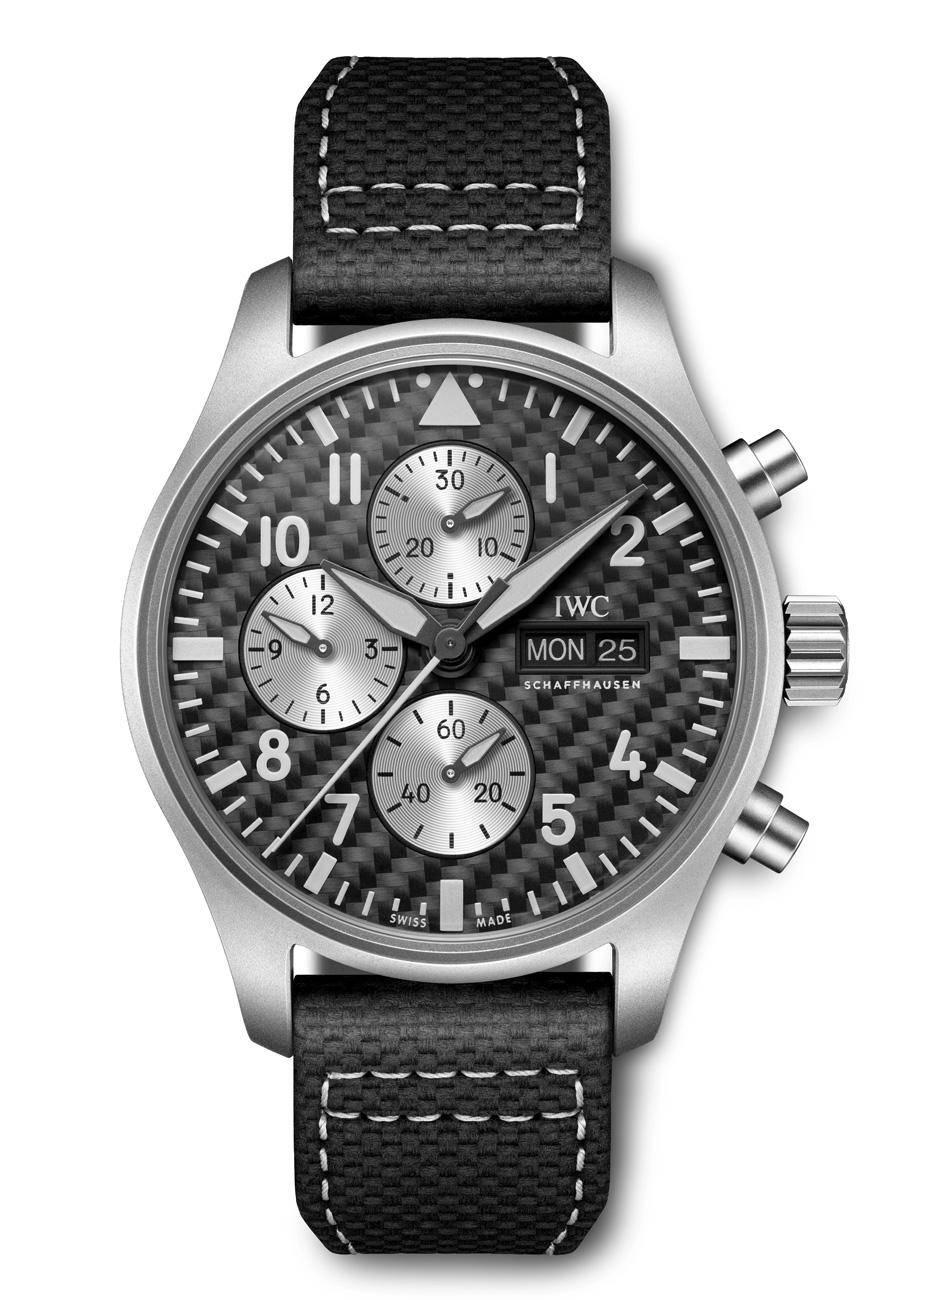 Pilot's-Watch-Chronograph-Edition-AMG-(2)_1.jpg